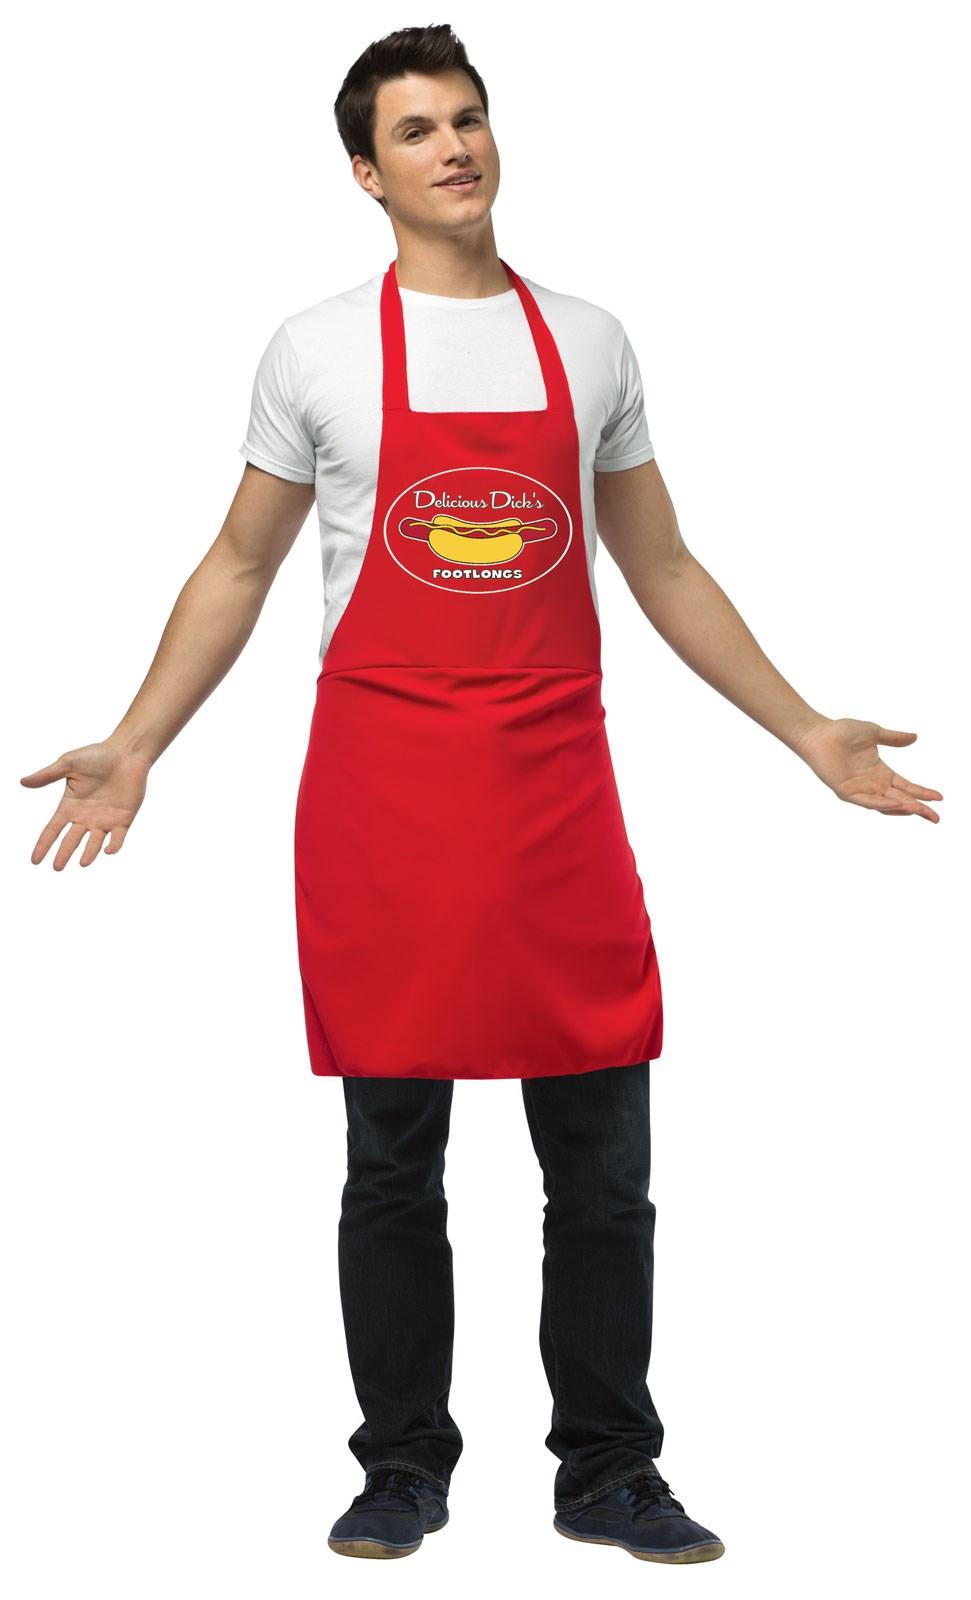 Image of Apron Hot Dog Vendor Adult Costume